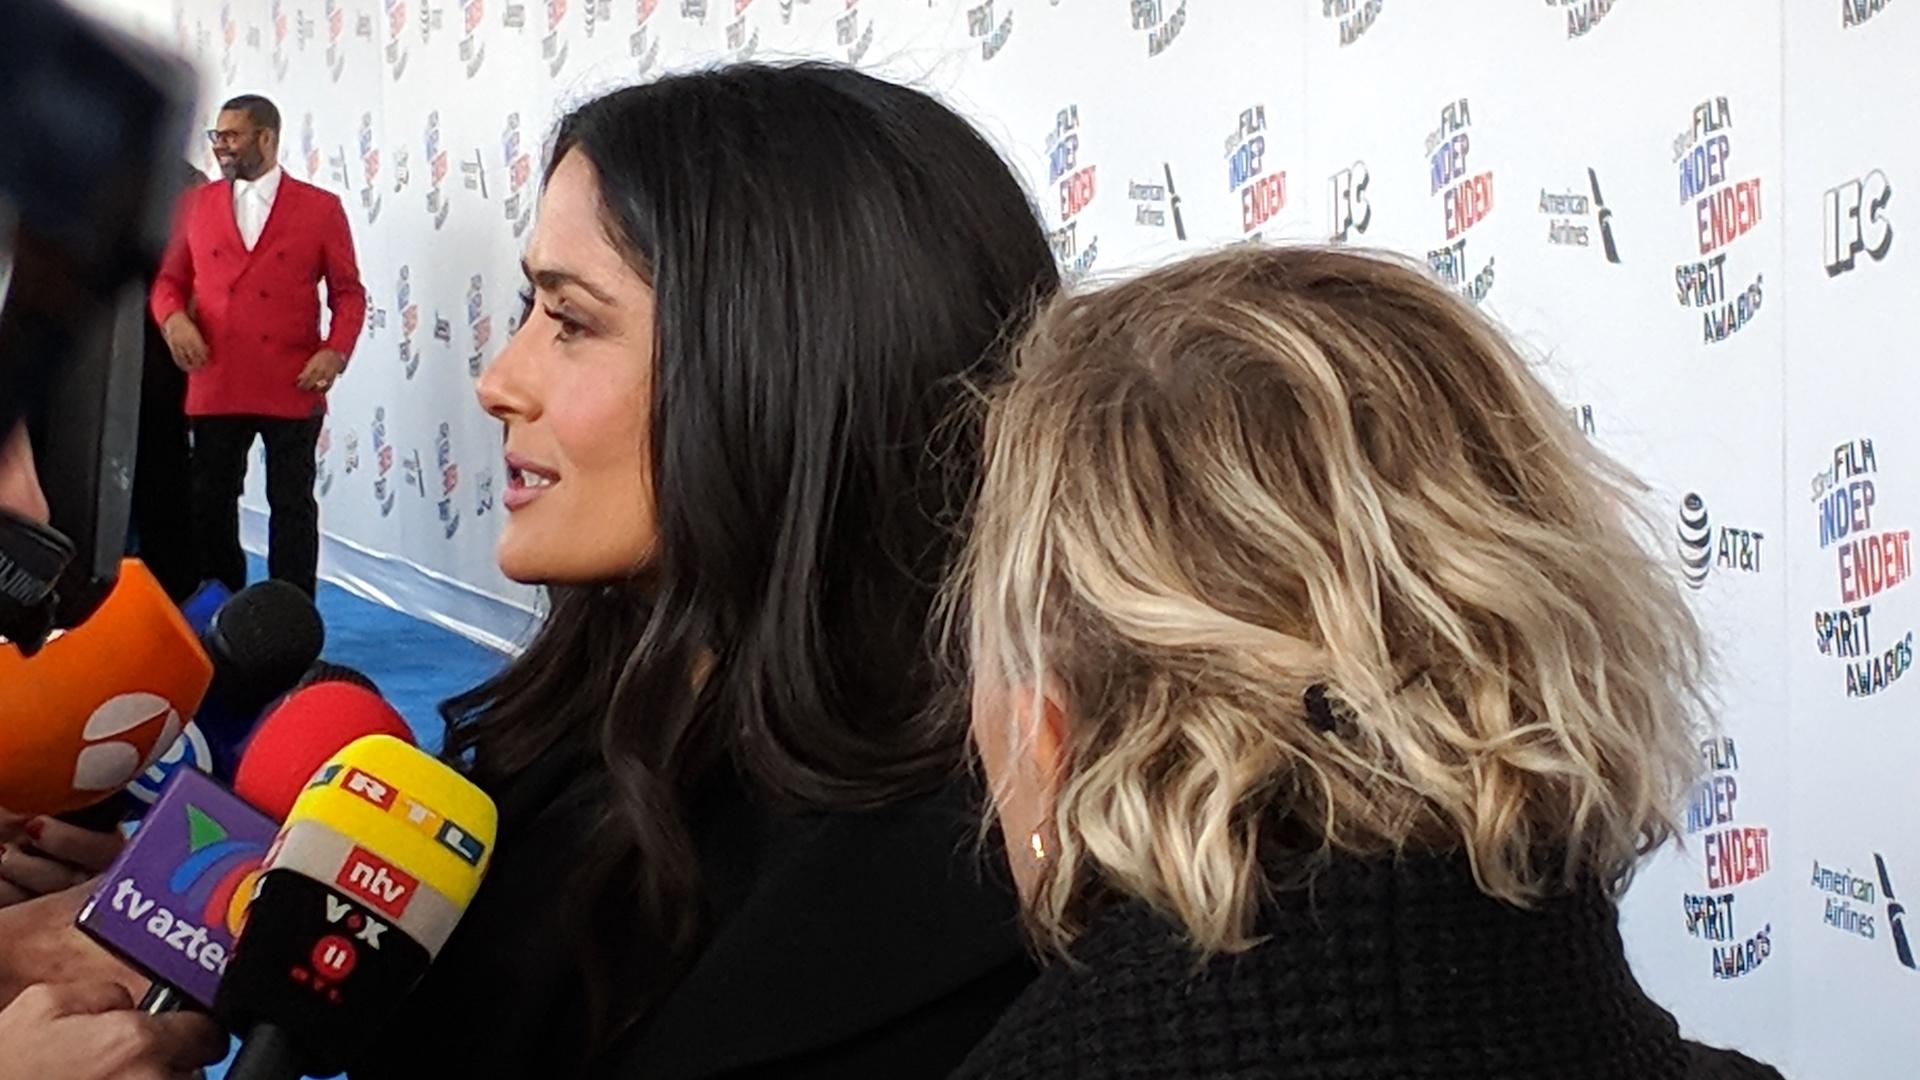 Salma Hayek at the 2018 Film Independent Spirit Awards